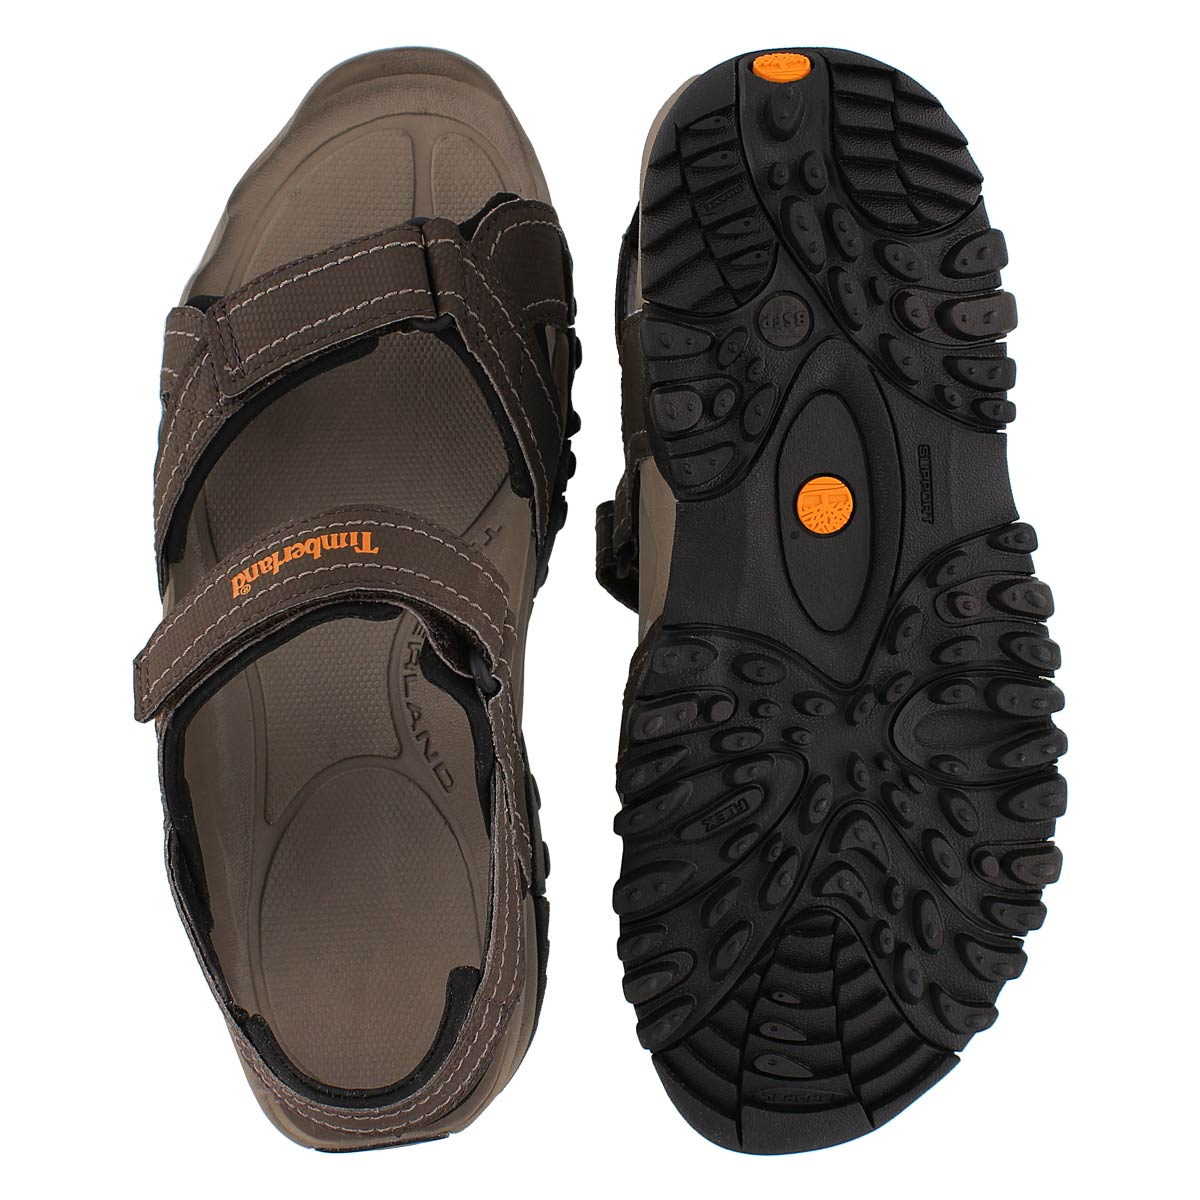 Sandale sport N GraniteTrailray, brn, ho